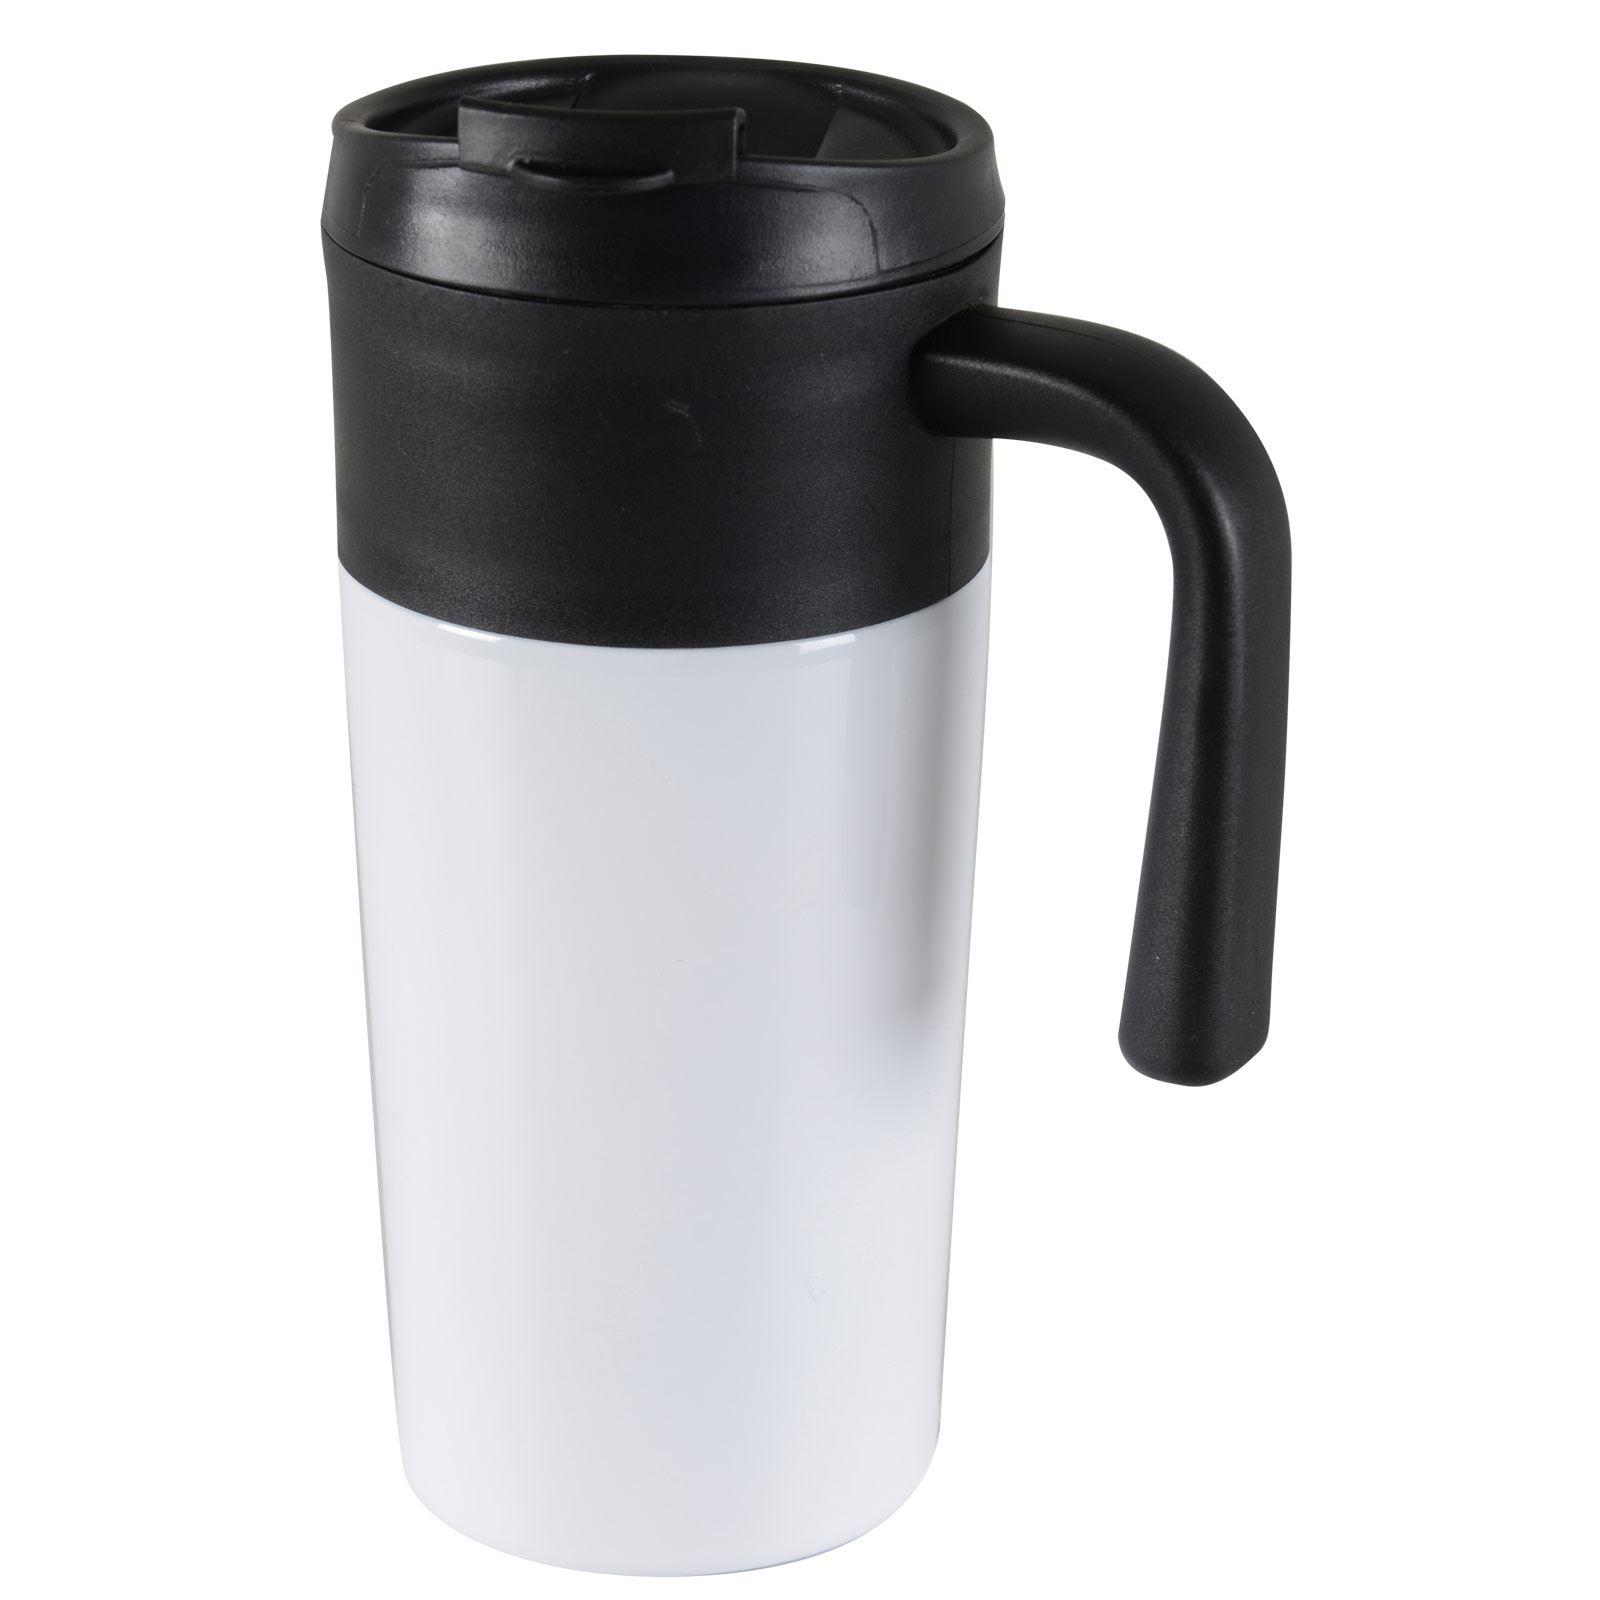 Tazza 450ml Thermal Mug Hot Warm Drinks Coffee Tea Travel